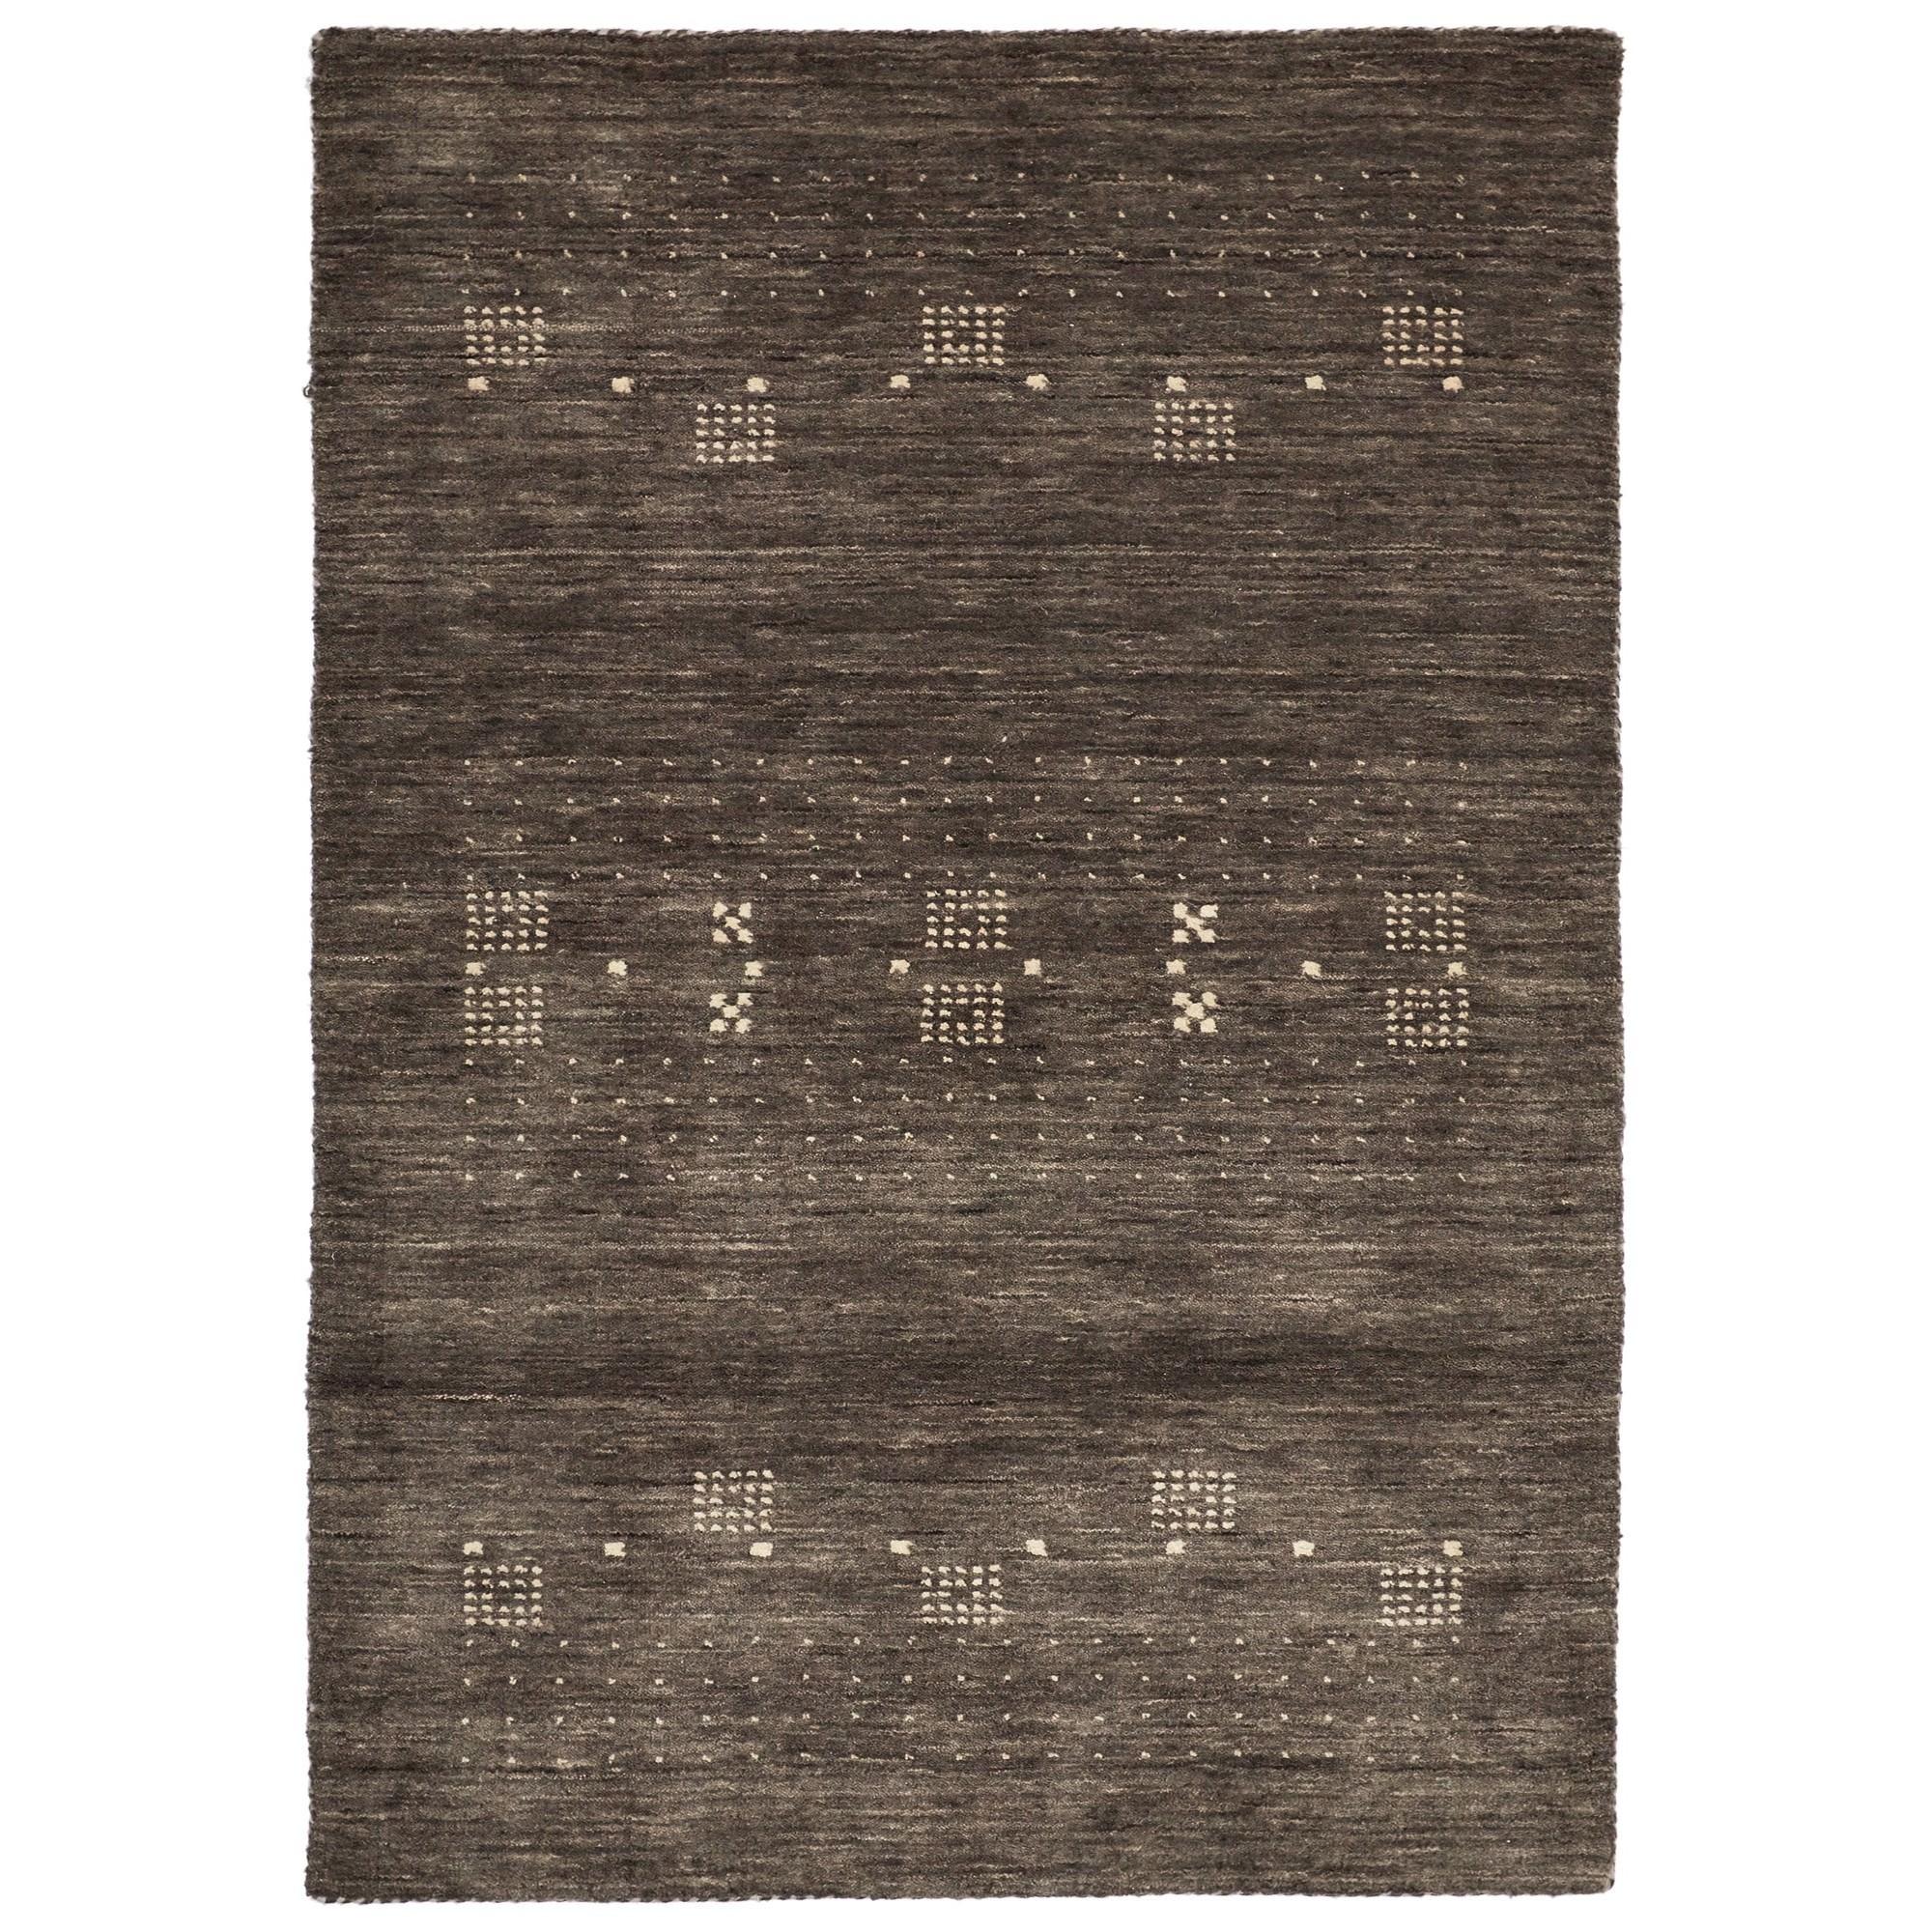 Lori No.042 Wool Tribal Rug, 330x240cm, Grey